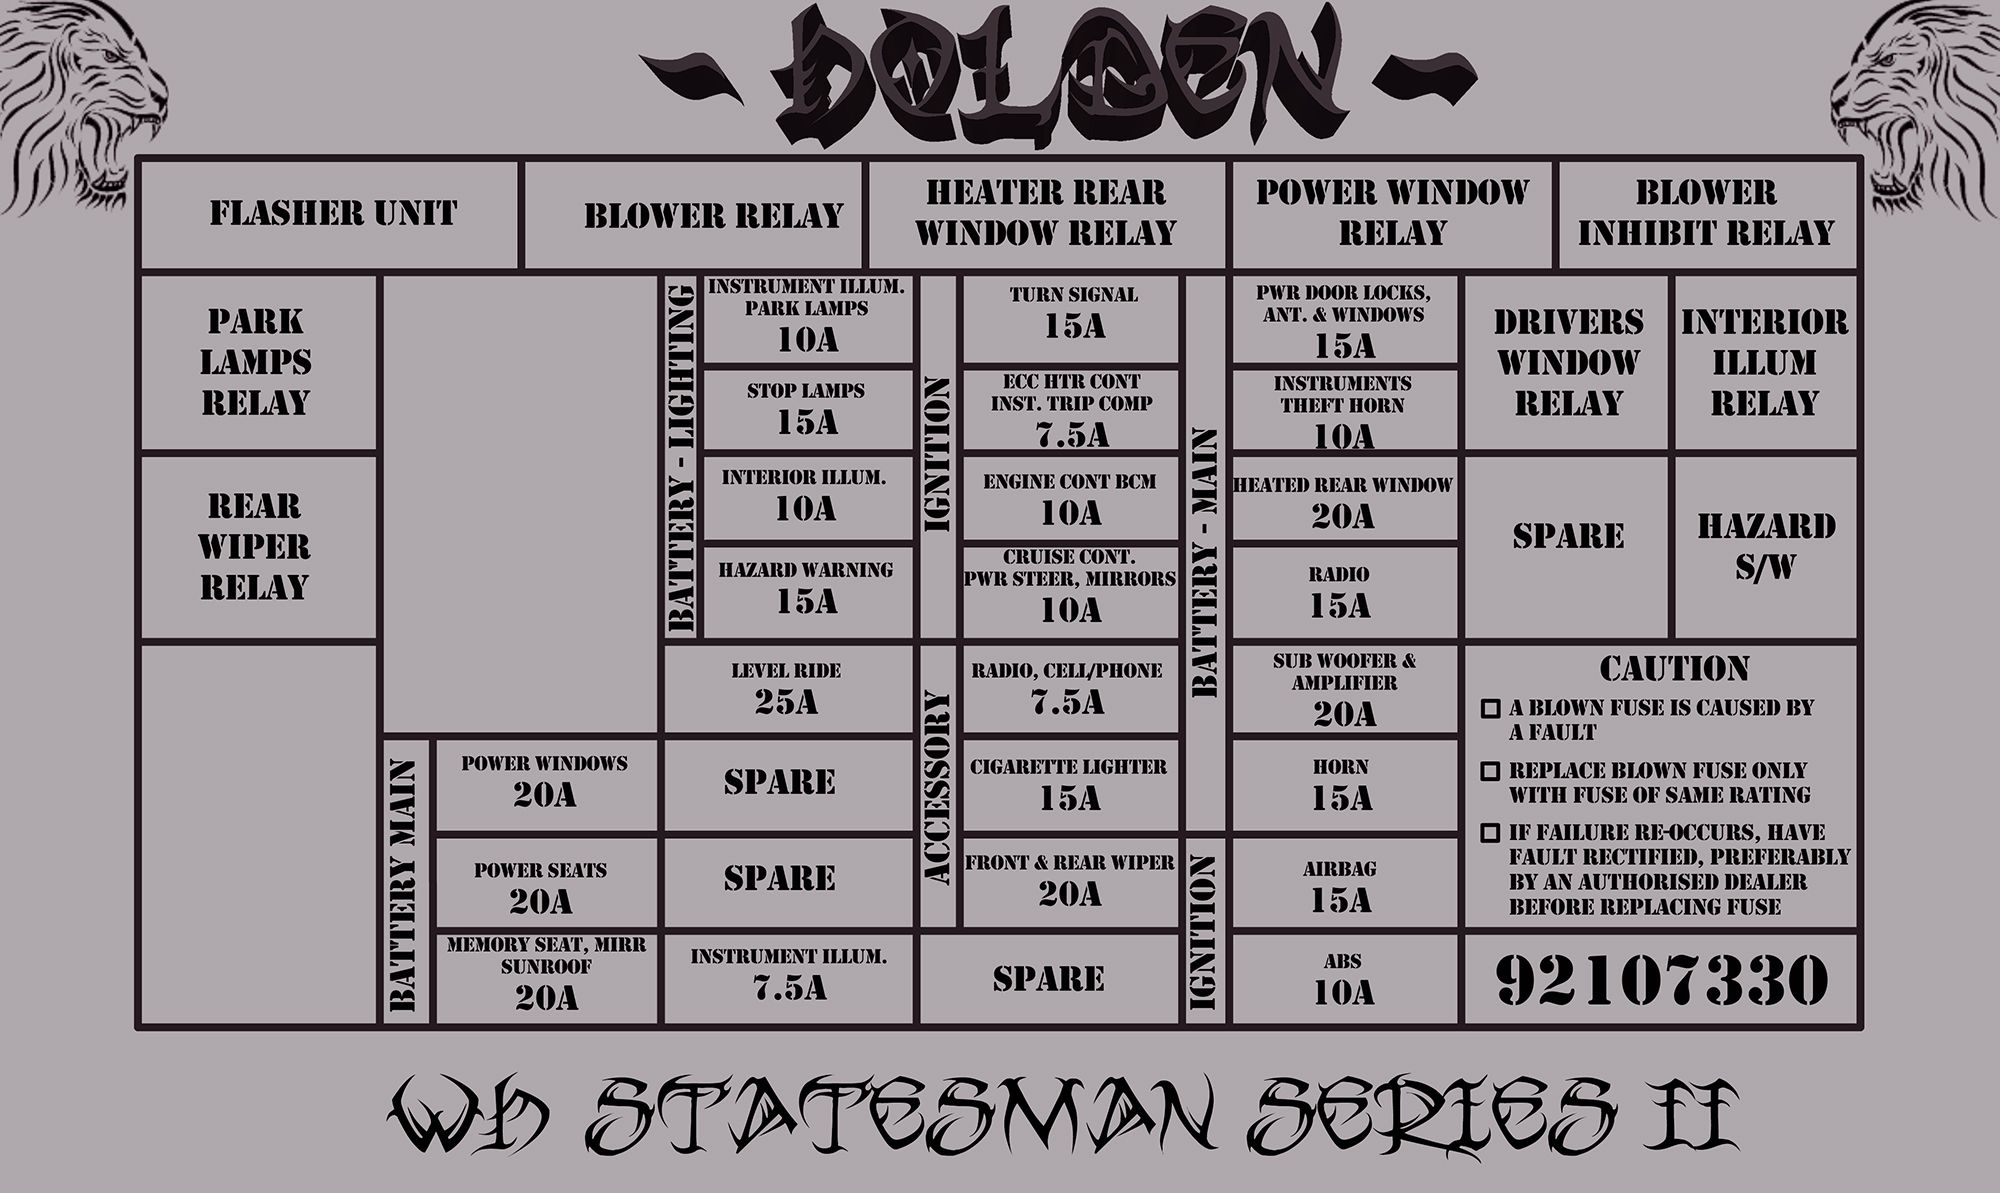 2002 WH Statesman Series II Fuse / Relay Diagram